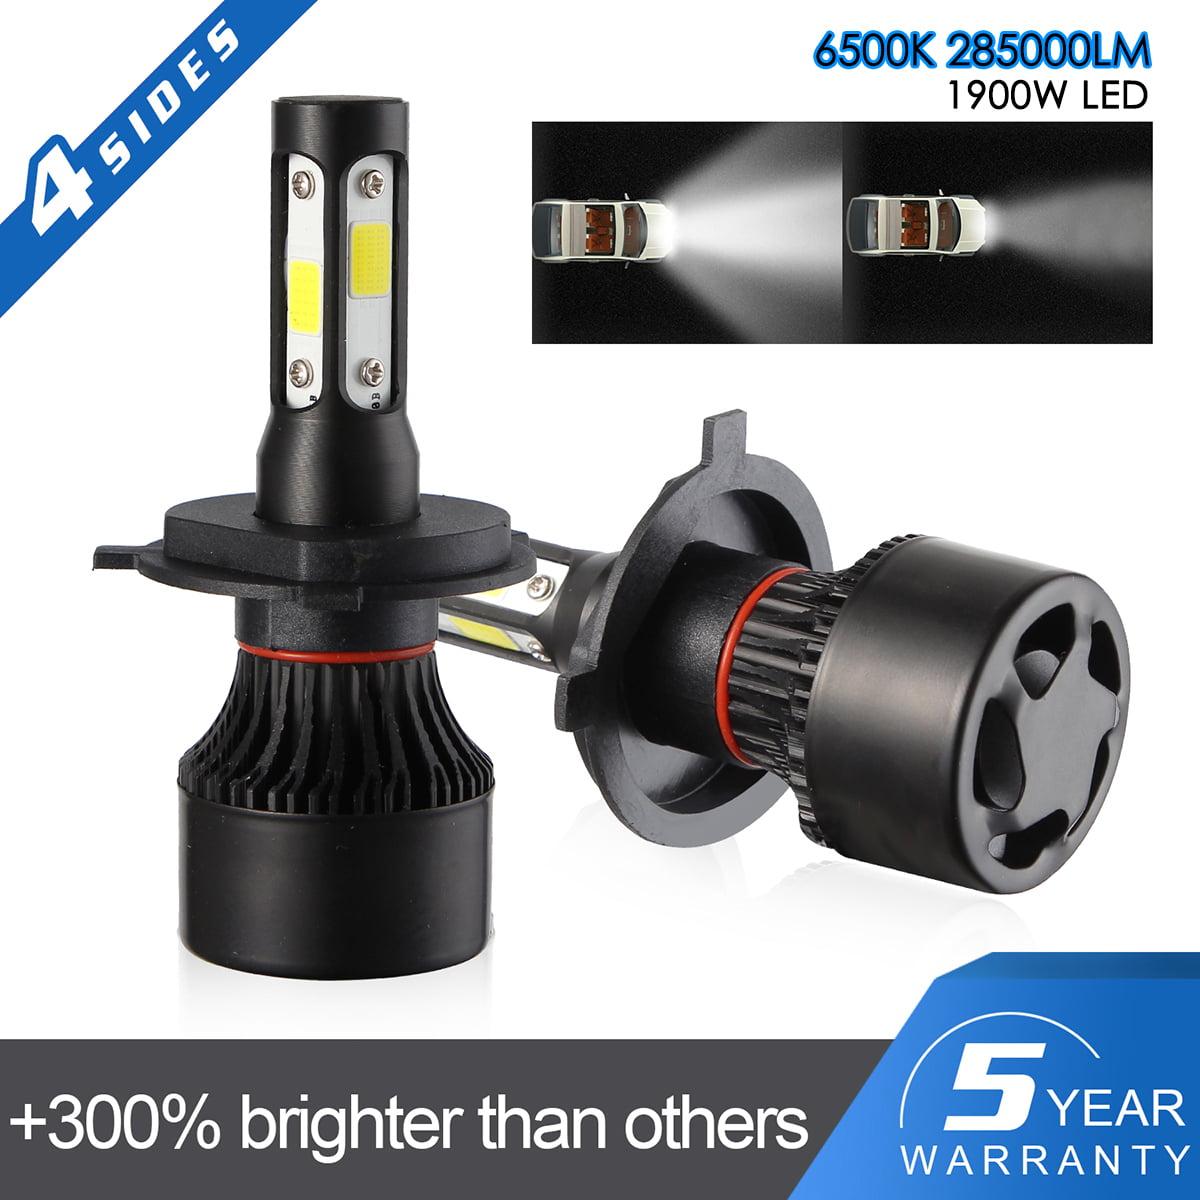 H11 H8 H9 1900W 285000LM LED Headlight Low Beam Bulb Dual Color Car Fog Headlamp